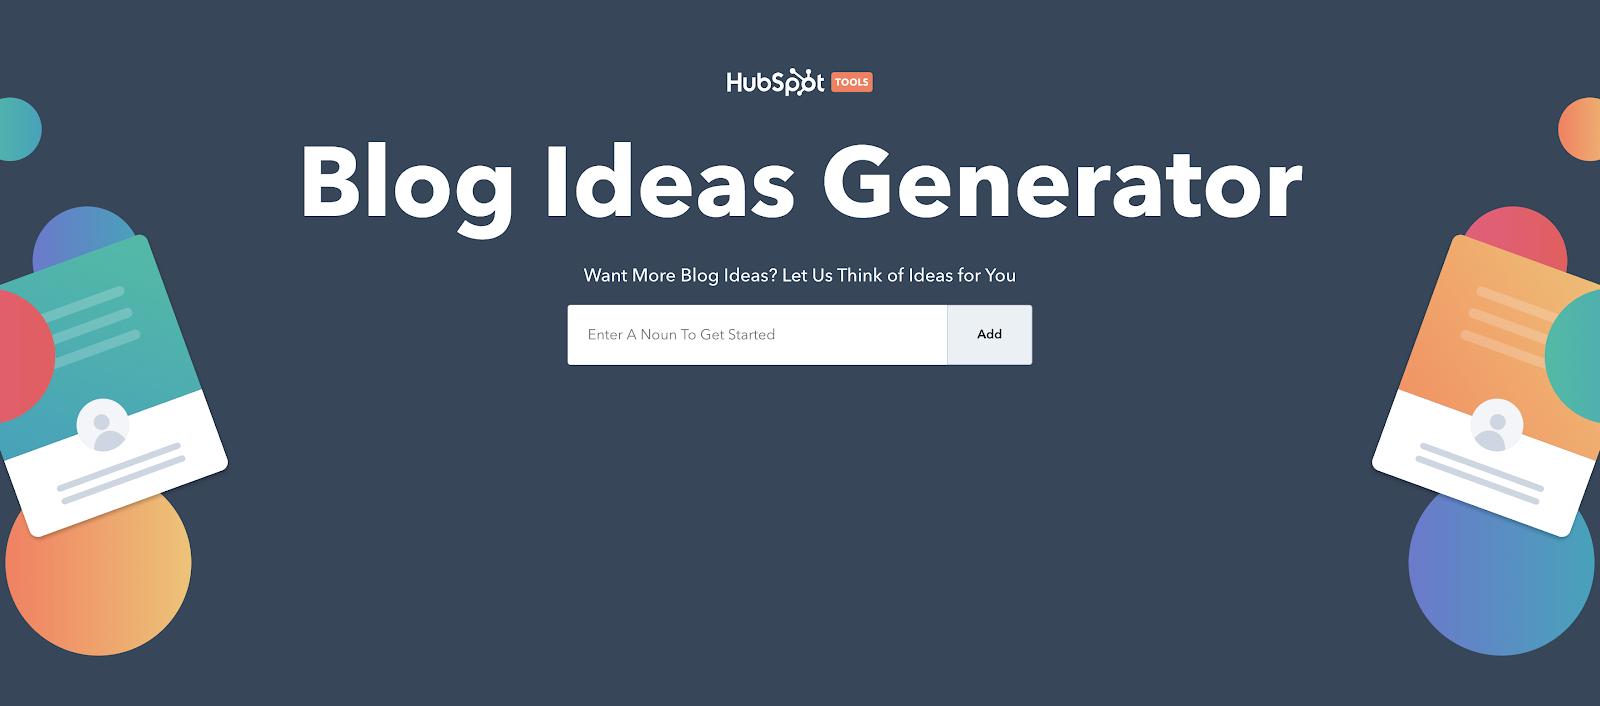 Hubspot blog ideas generator within the bluish-gray background.